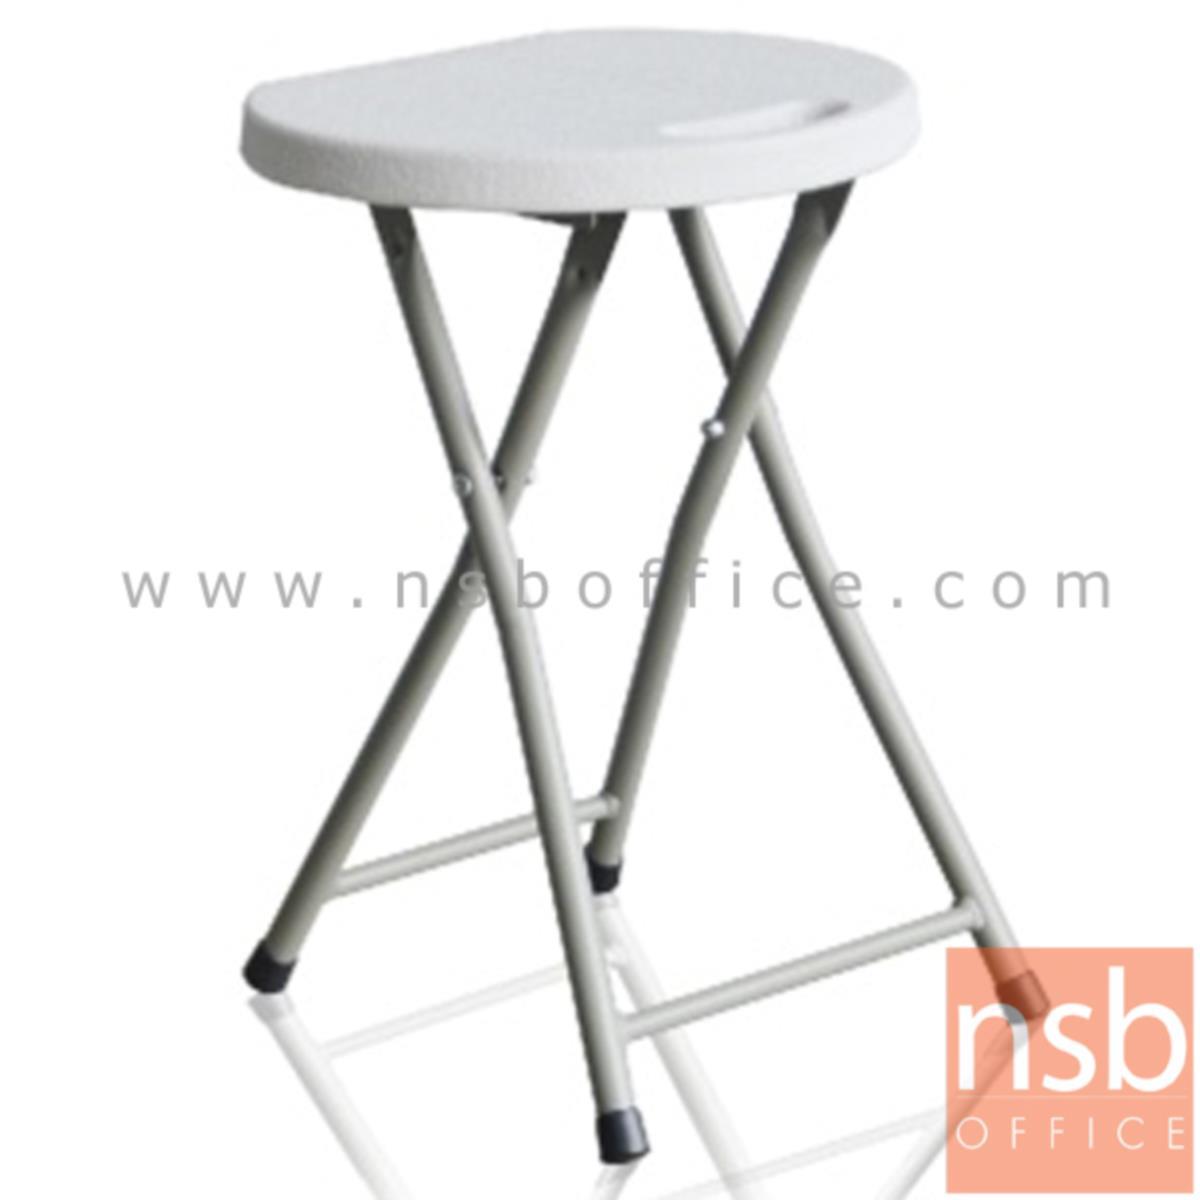 A19A046:เก้าอี้พับที่นั่งพลาสติก รุ่น Rivalen (ริวาเลน) ขาเหล็กพ่นสี